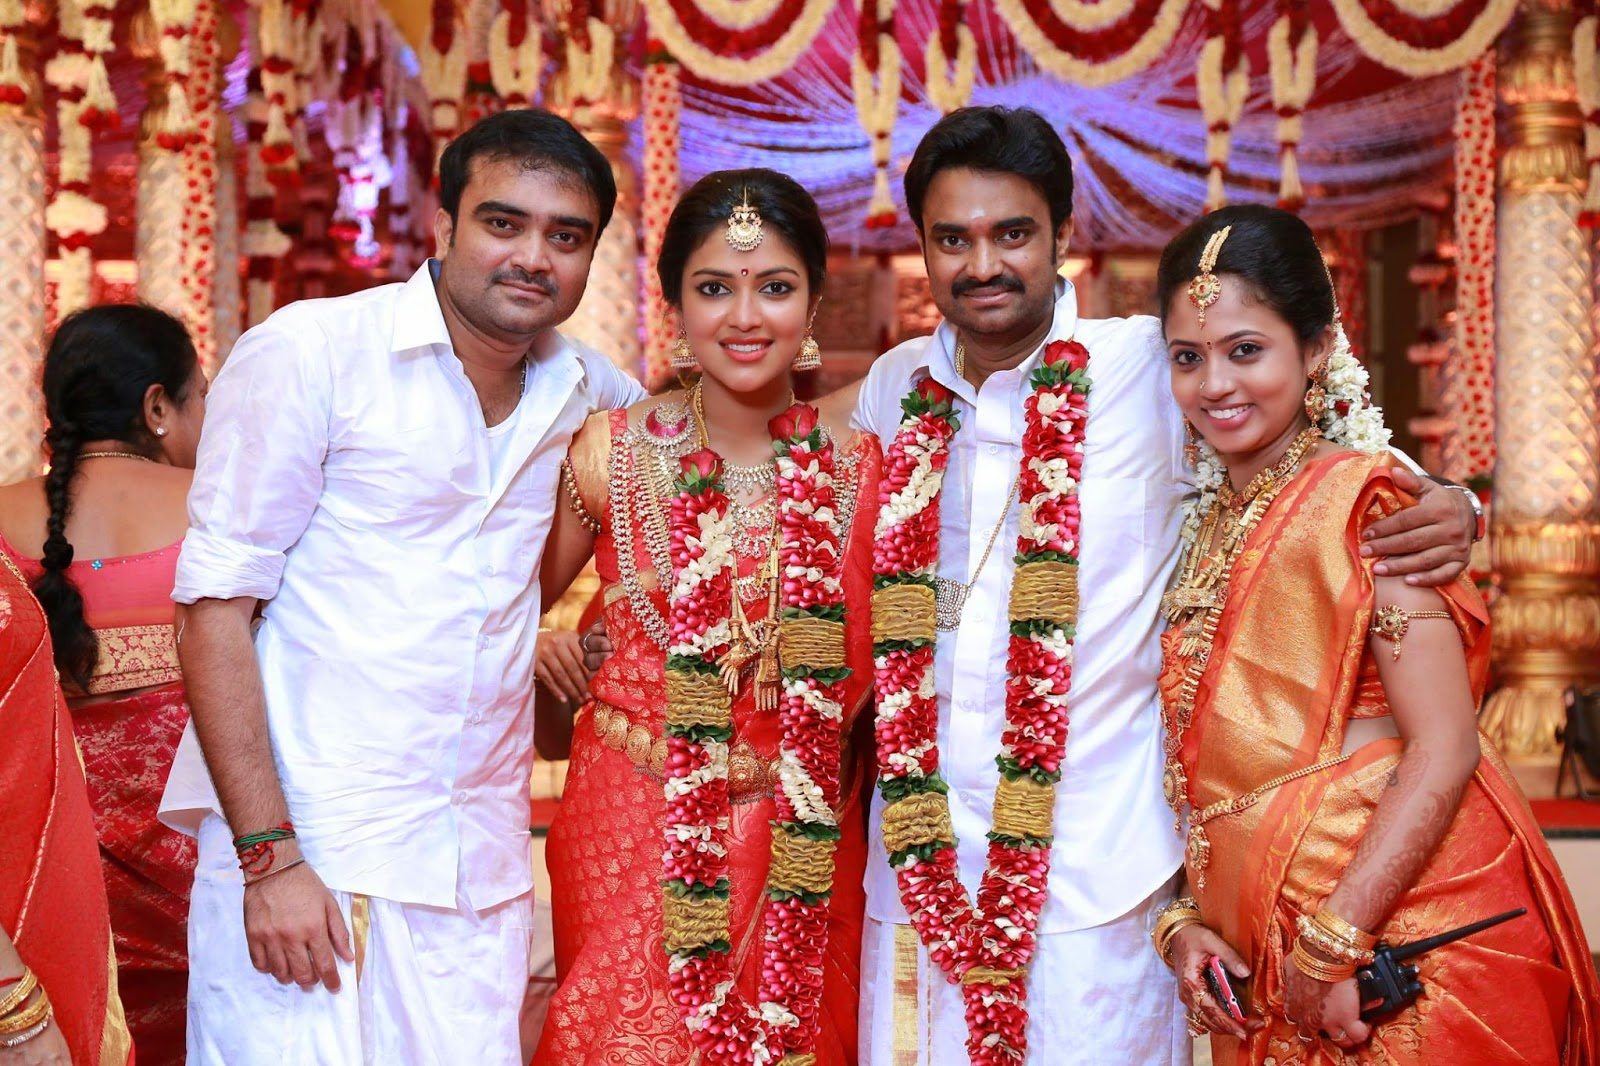 Amala Paul Al Vijay wedding Photos gallery-HQ-Photo-8